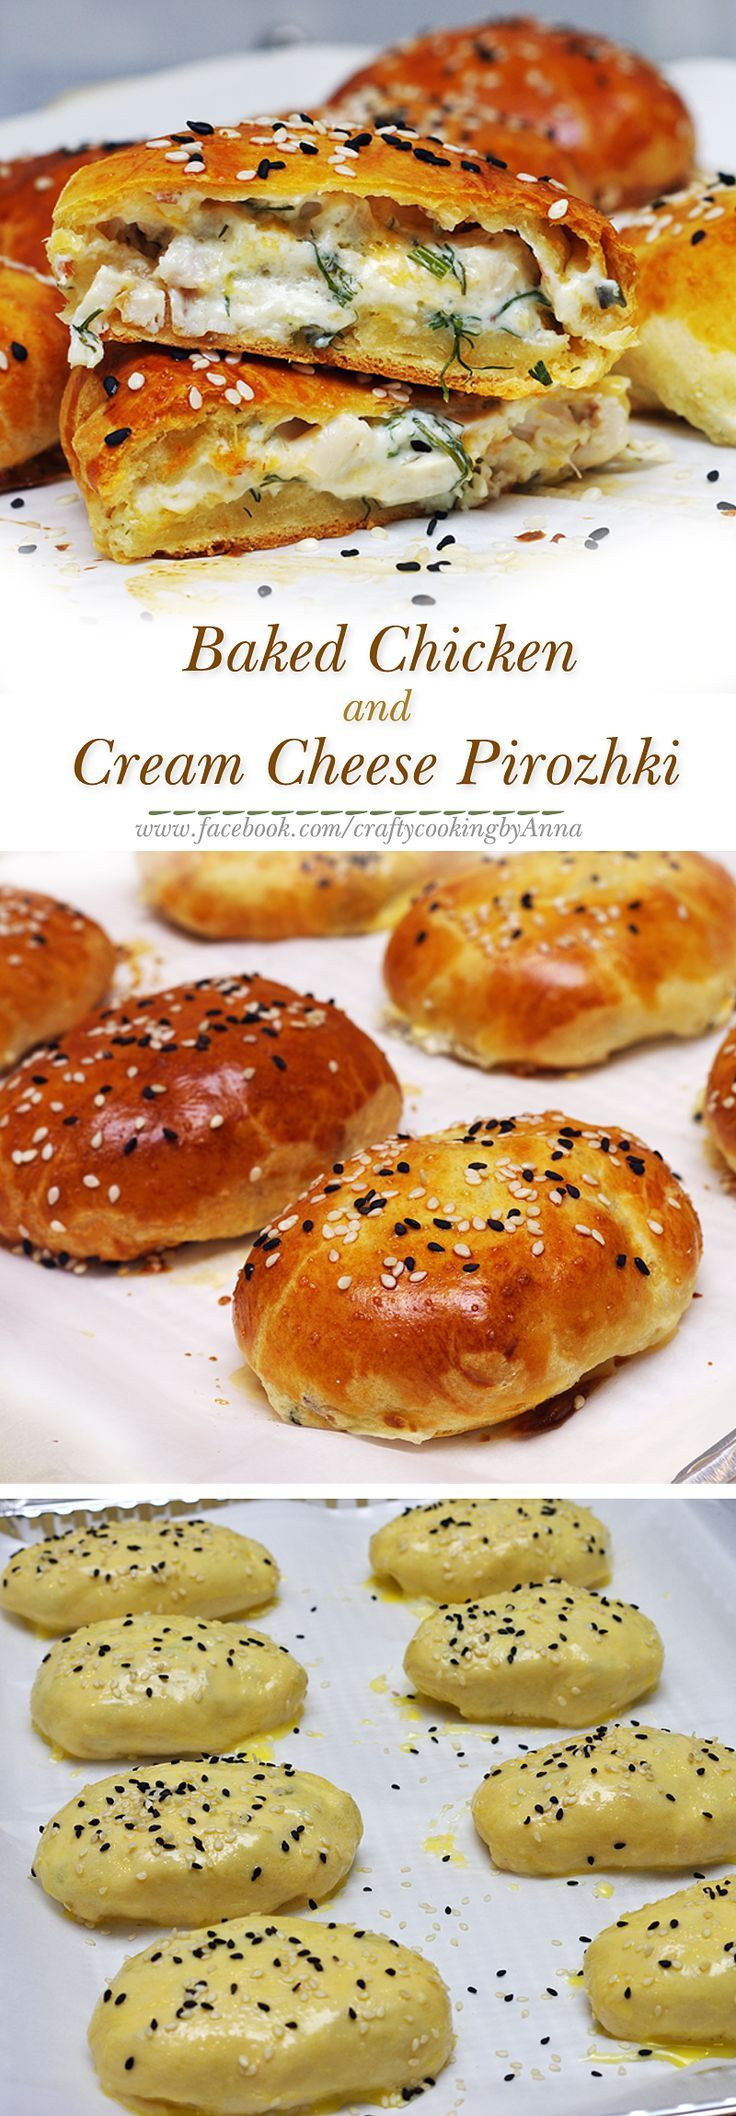 Perhaps not the Baked Chicken part, but still Piroshki's!